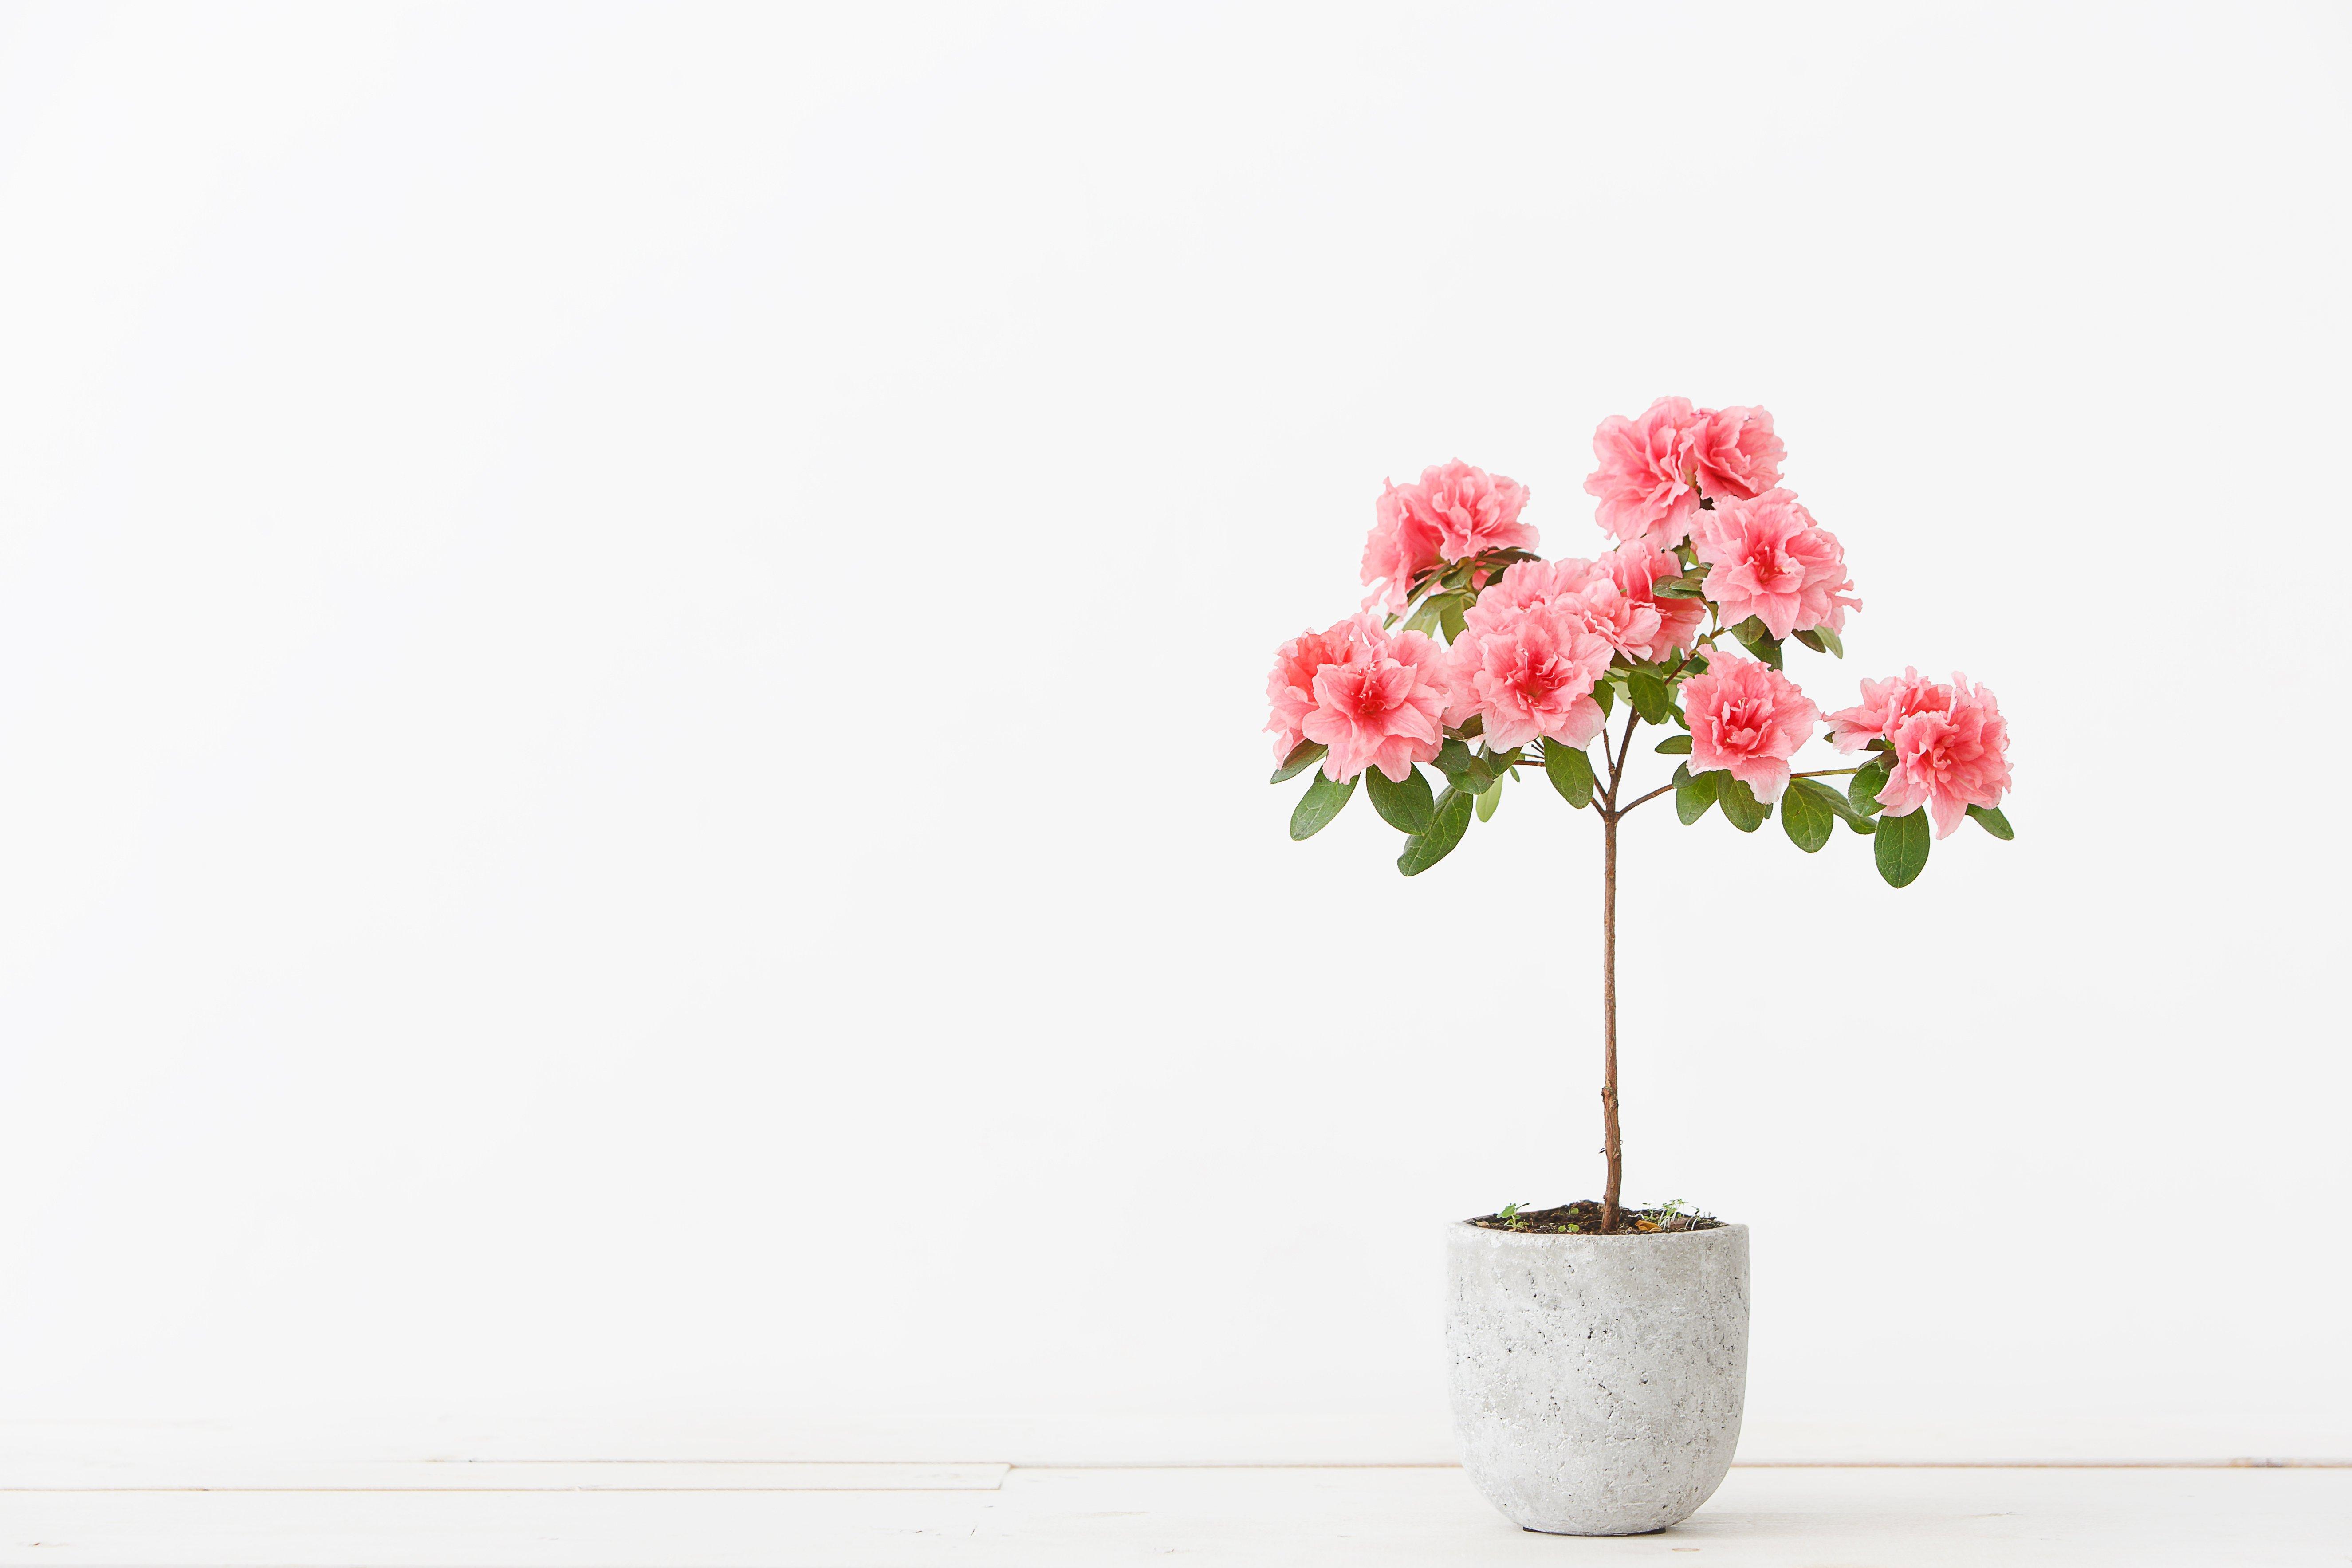 Canva - Pink azalea flower in a concrete pot